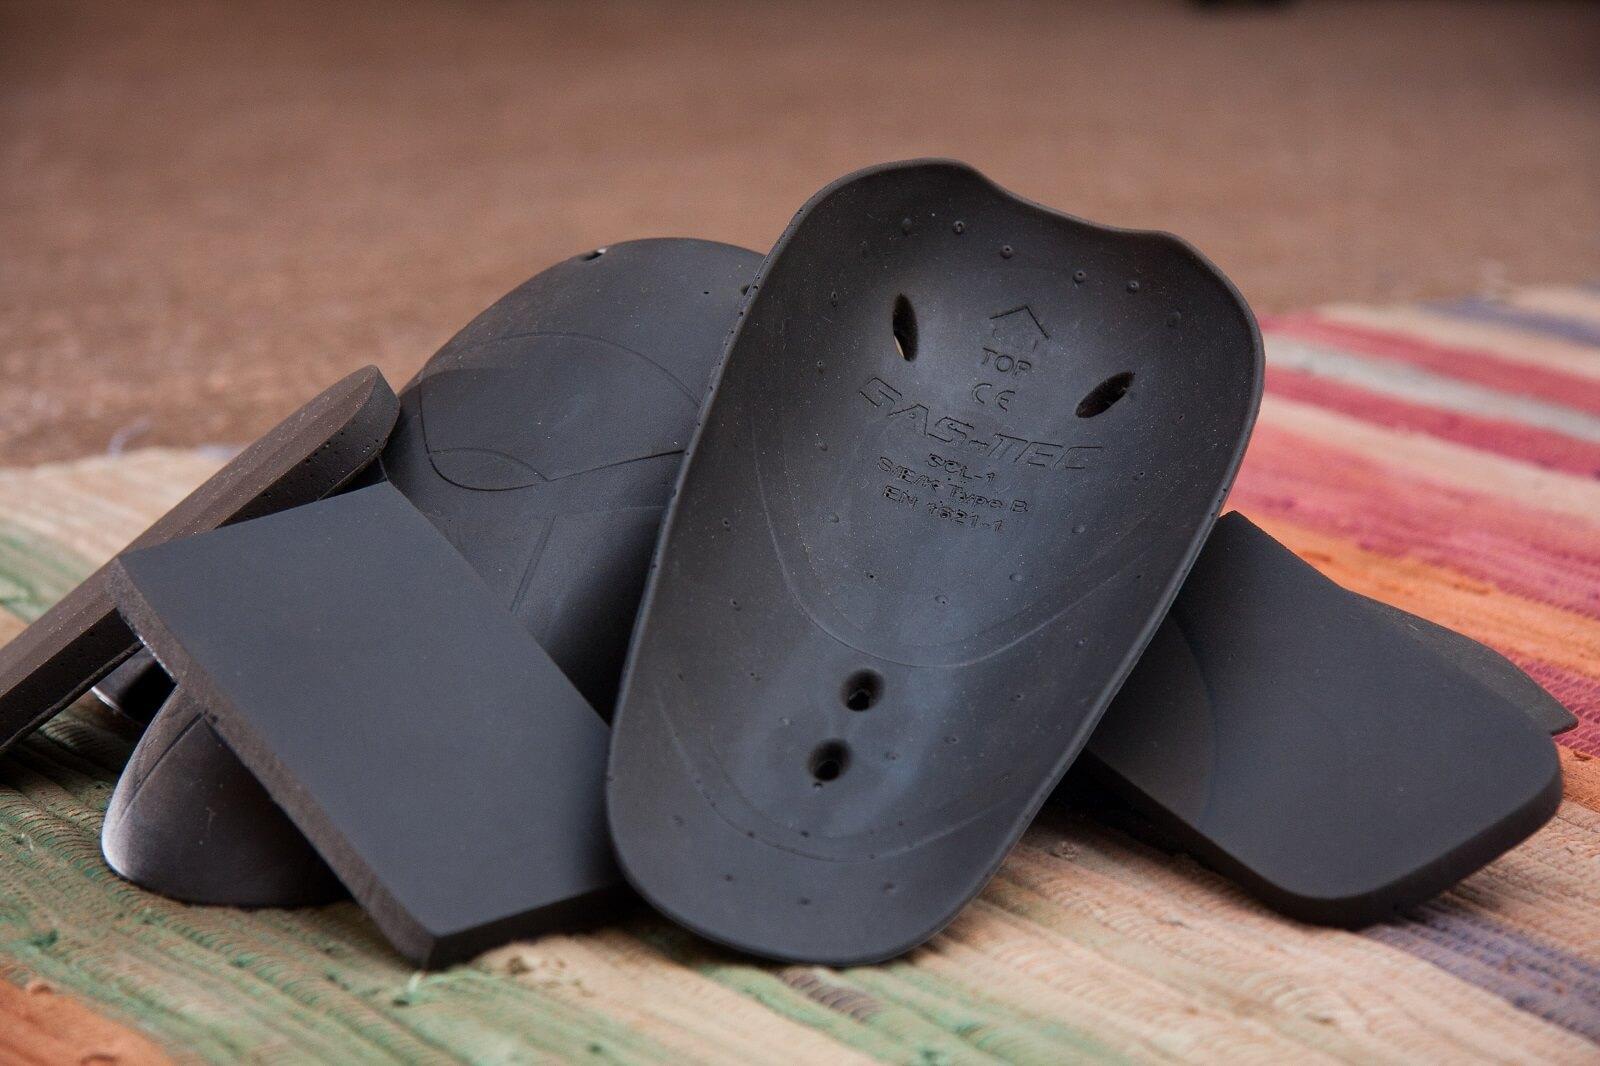 Sas-tec knieprotectoren kevlar